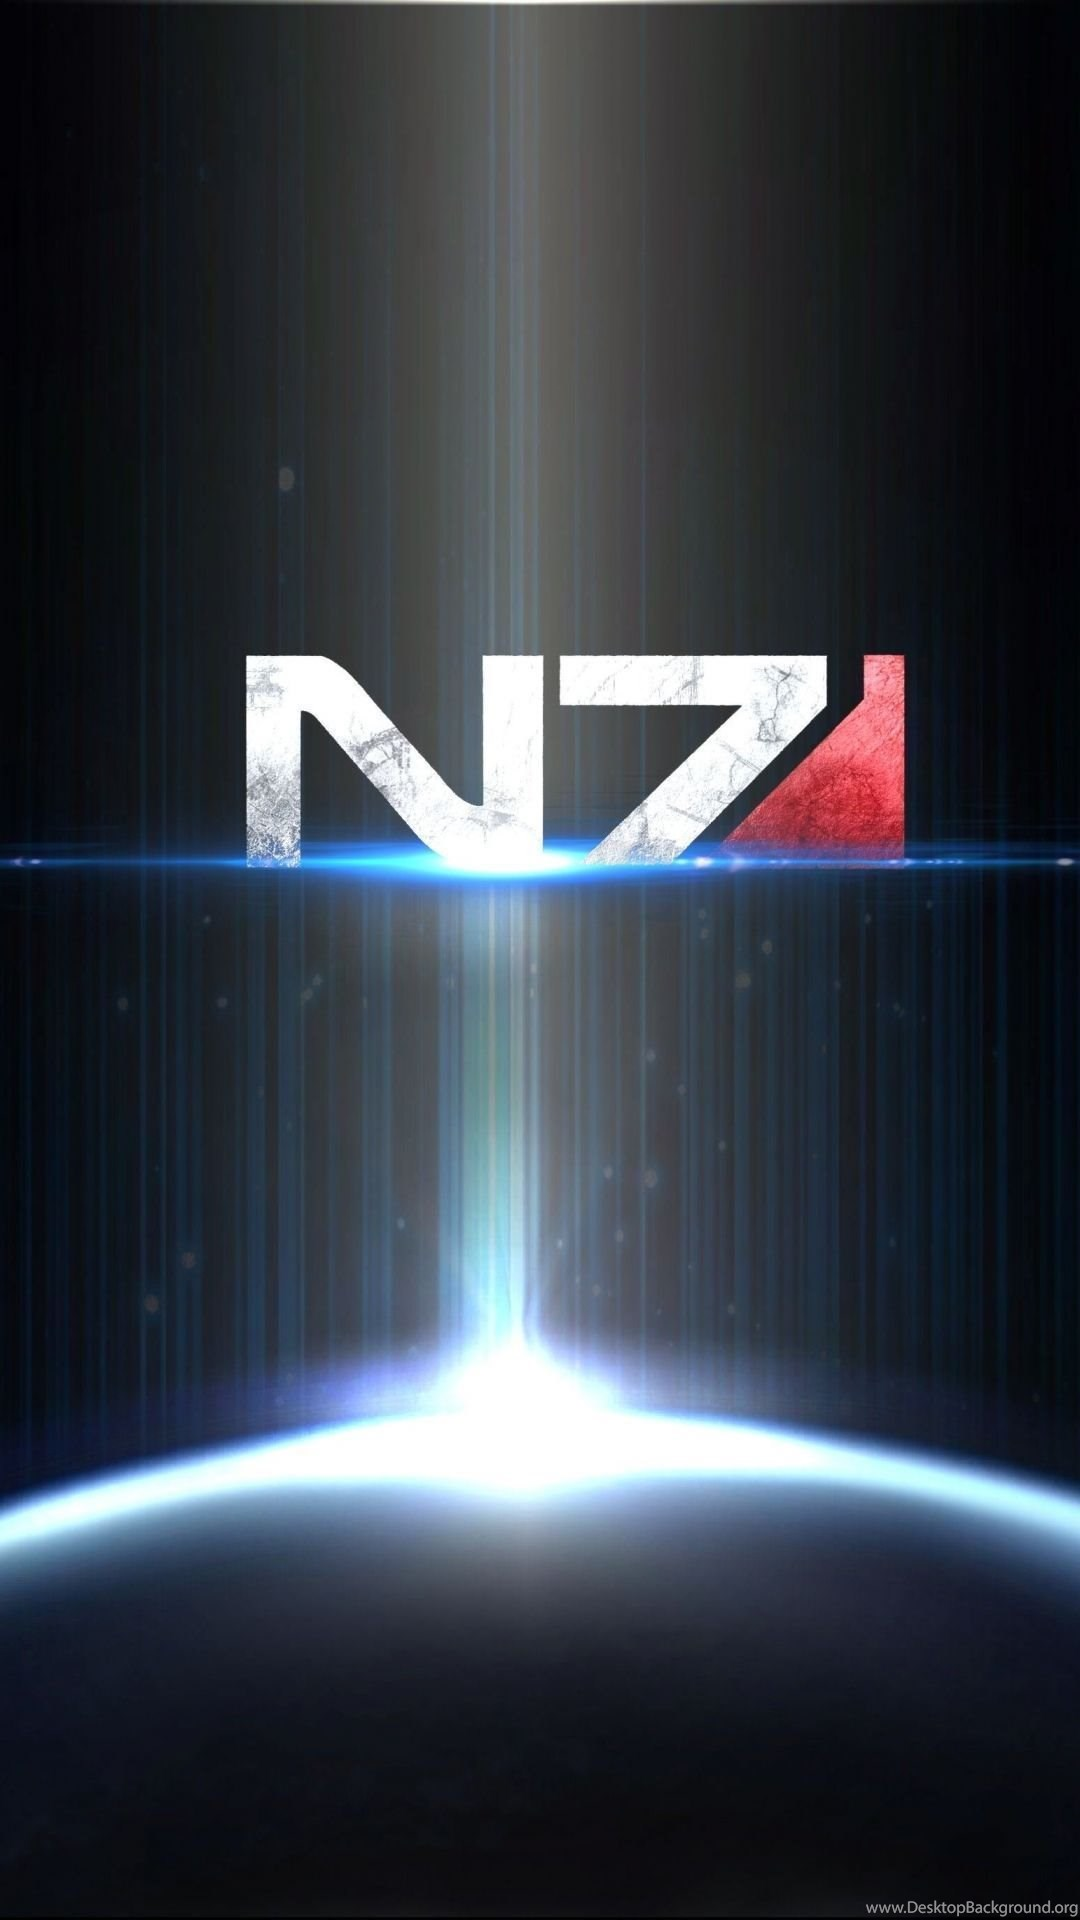 Iphone 5 Video Game Mass Effect Wallpapers Id 379565 Desktop